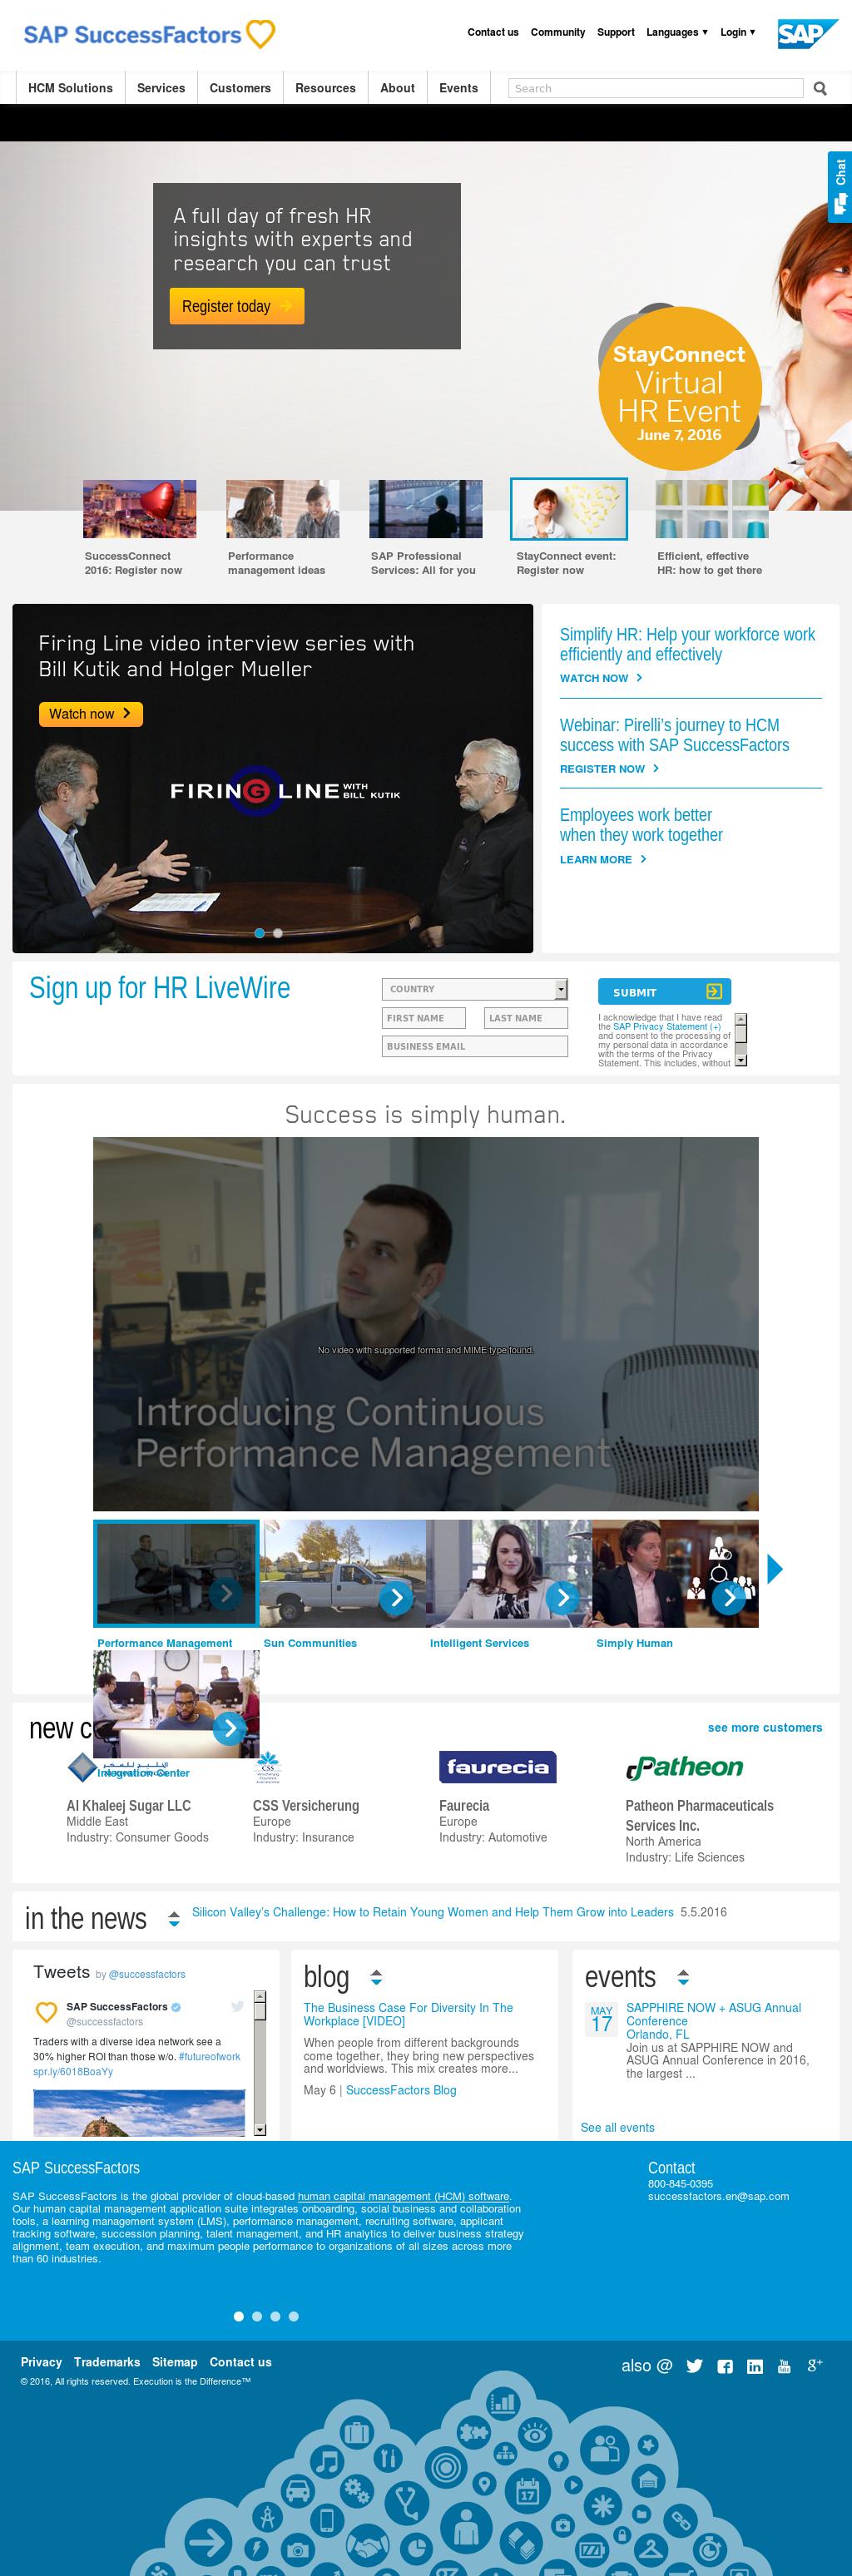 SAP SuccessFactors Competitors, Revenue and Employees - Owler